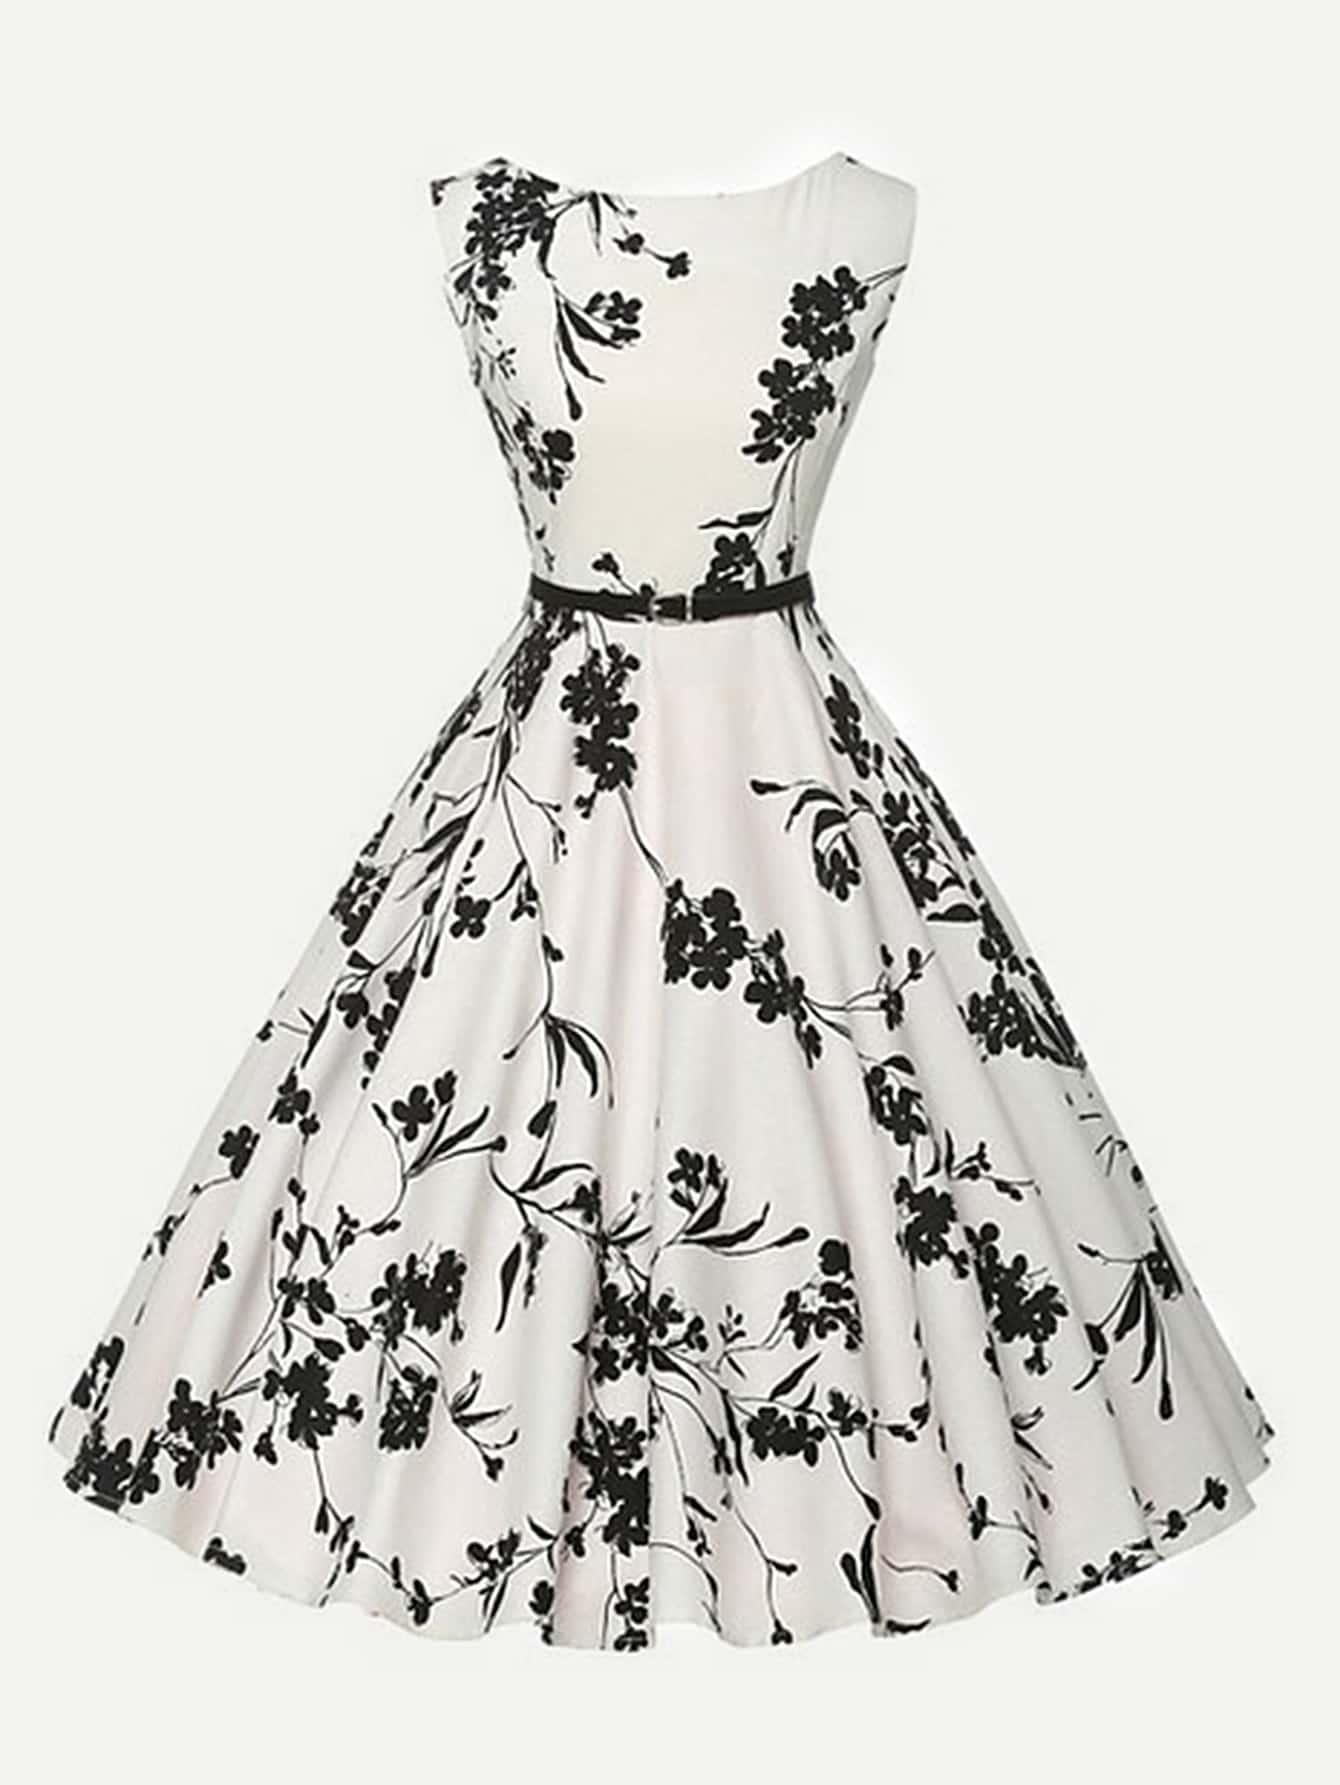 All Over Florals Circle Dress With Belt all over florals m slit dress